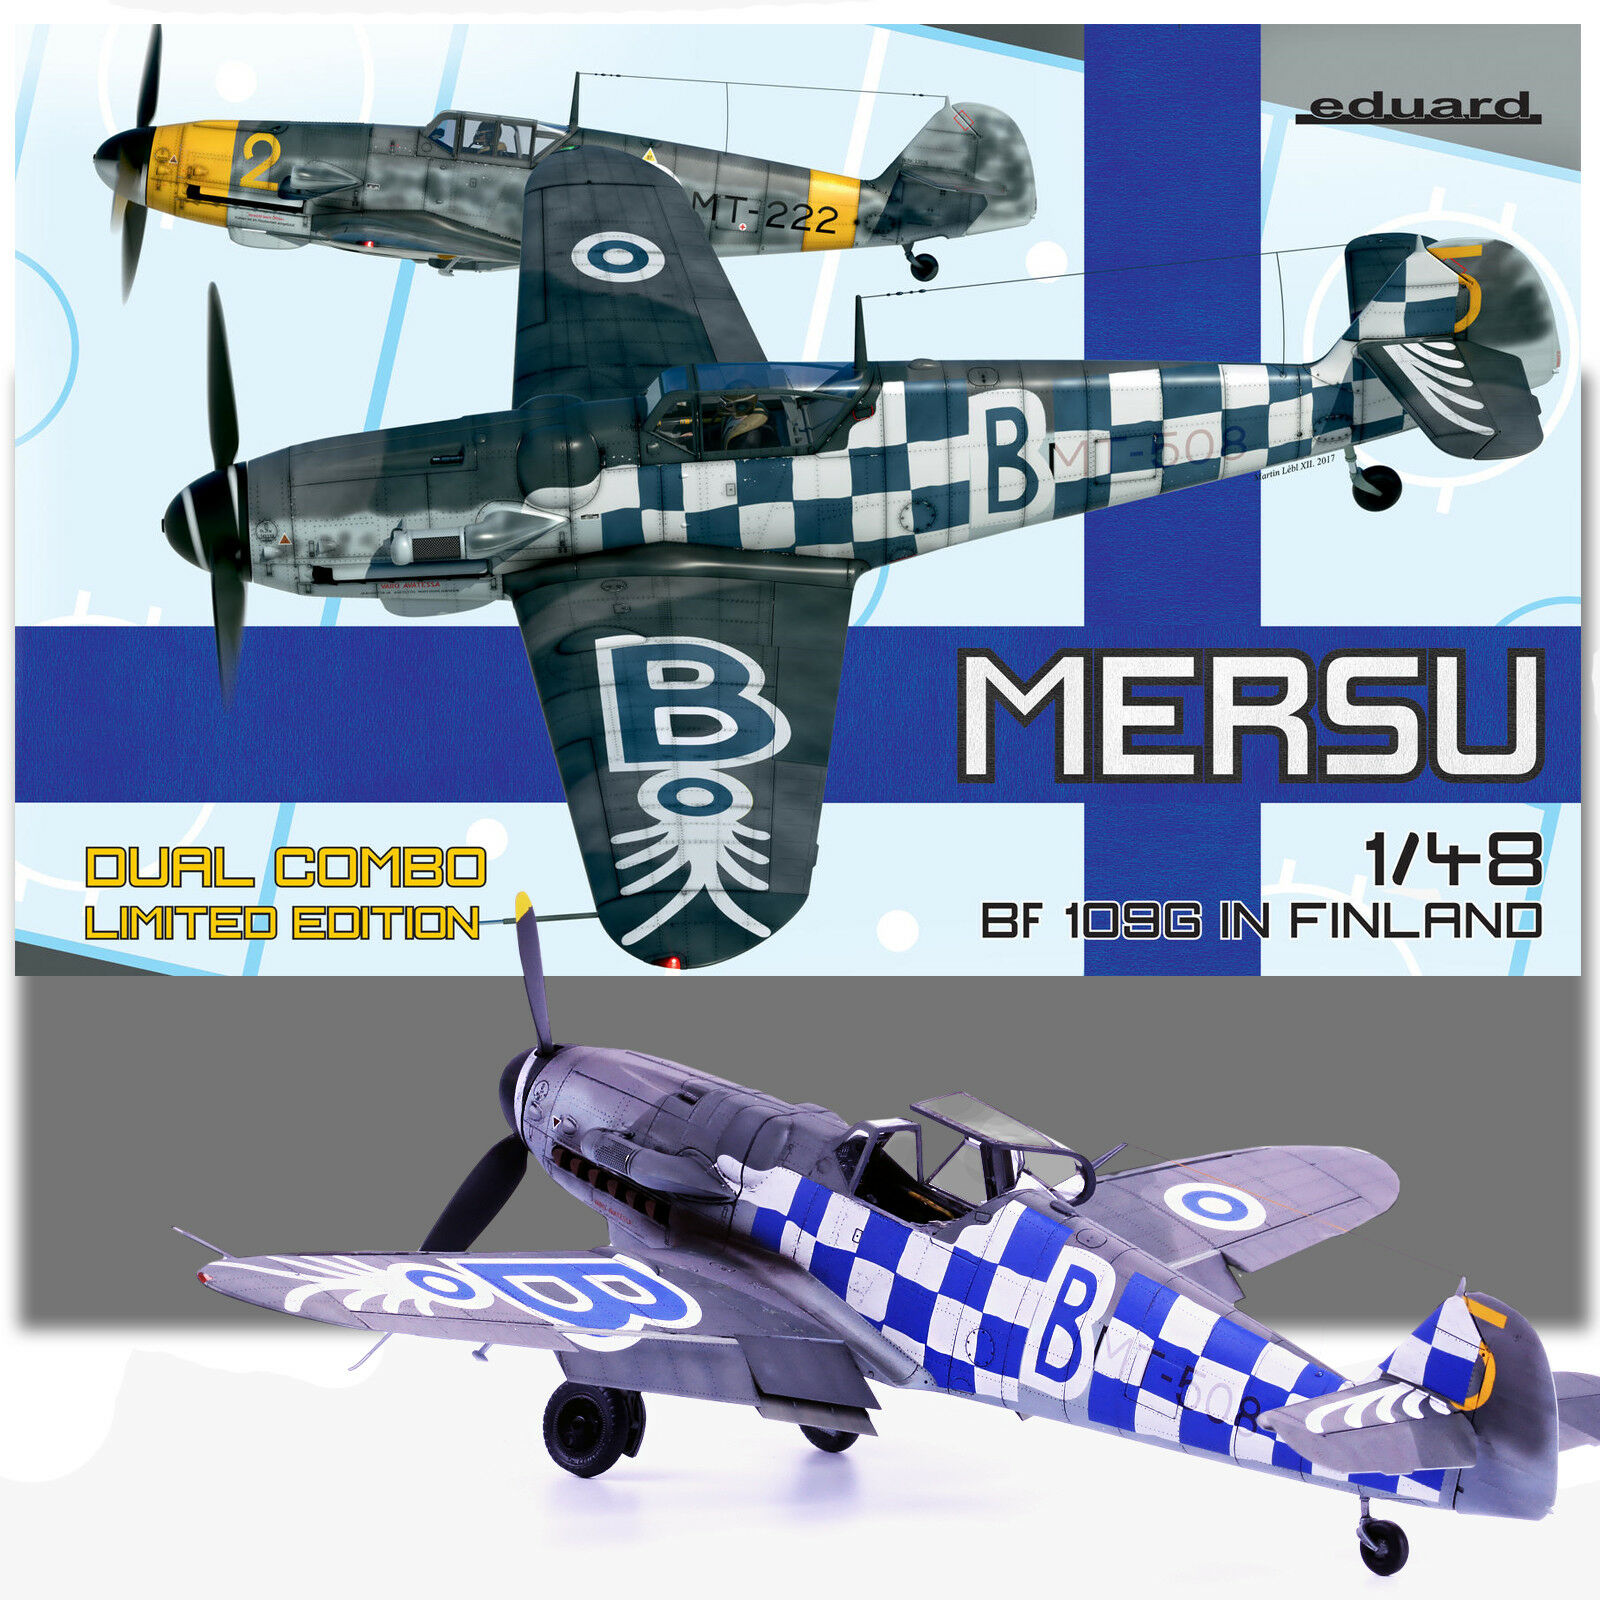 Eduard 1/48 Mersu 'BF-109G en Finlandia Dual Combo Kit de edición limitada de 11114